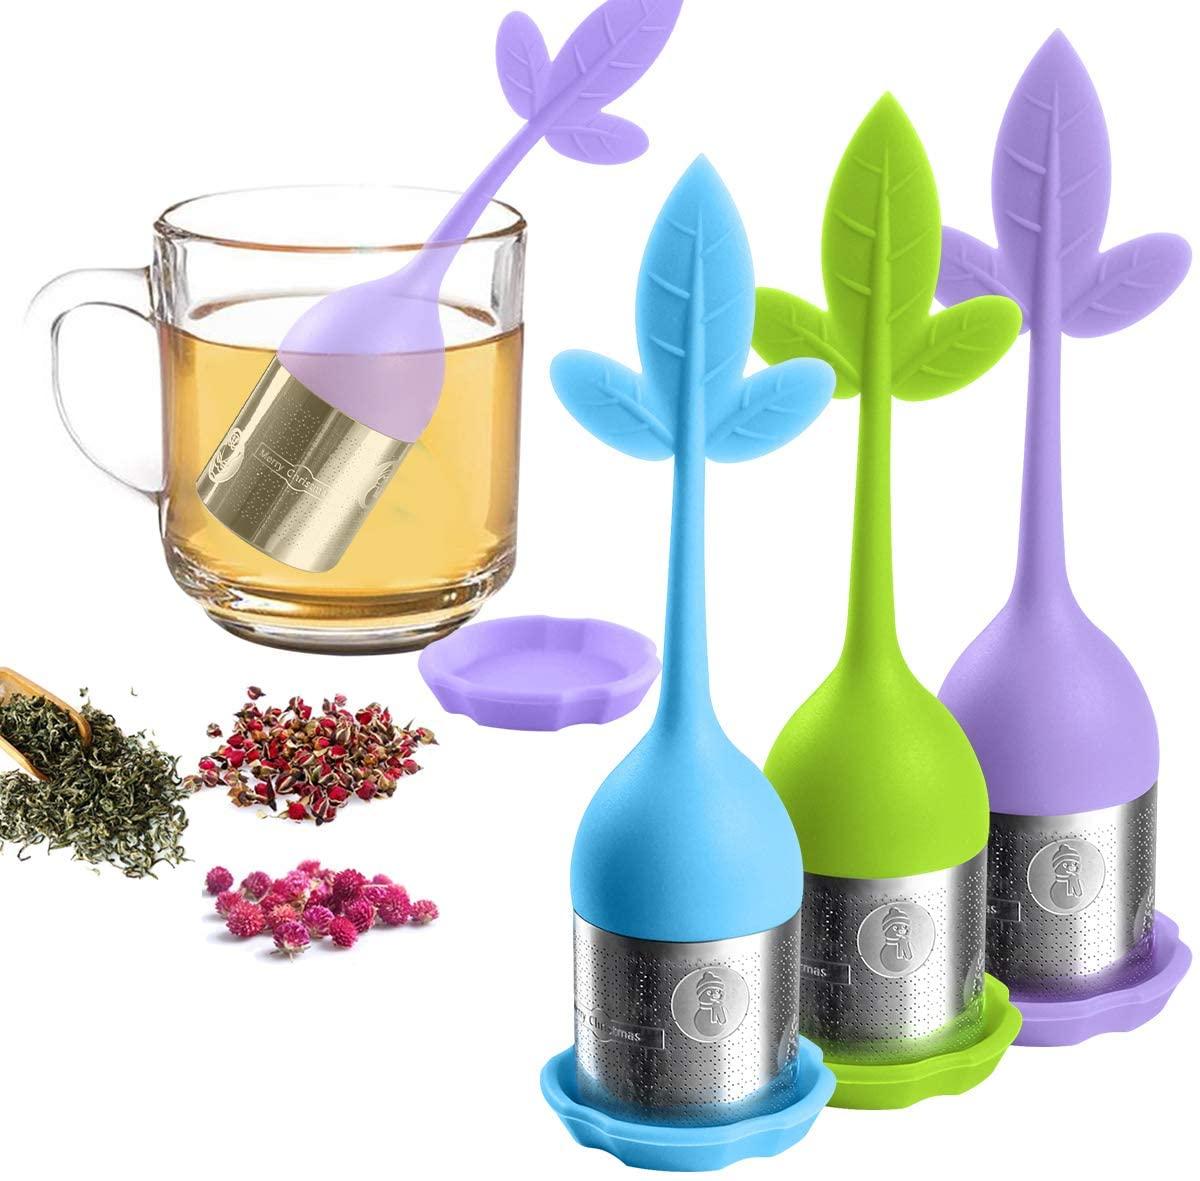 Loose Leaf Tea Infuser, Tea Strainer for Loose Tea Fine Mesh Tea Filter for Steeping Loose Tea, Tea Steeper for Teapot, Tea Diffuser w/Maple Shaped Silicone Handle, Stainless Steel Infuser Set